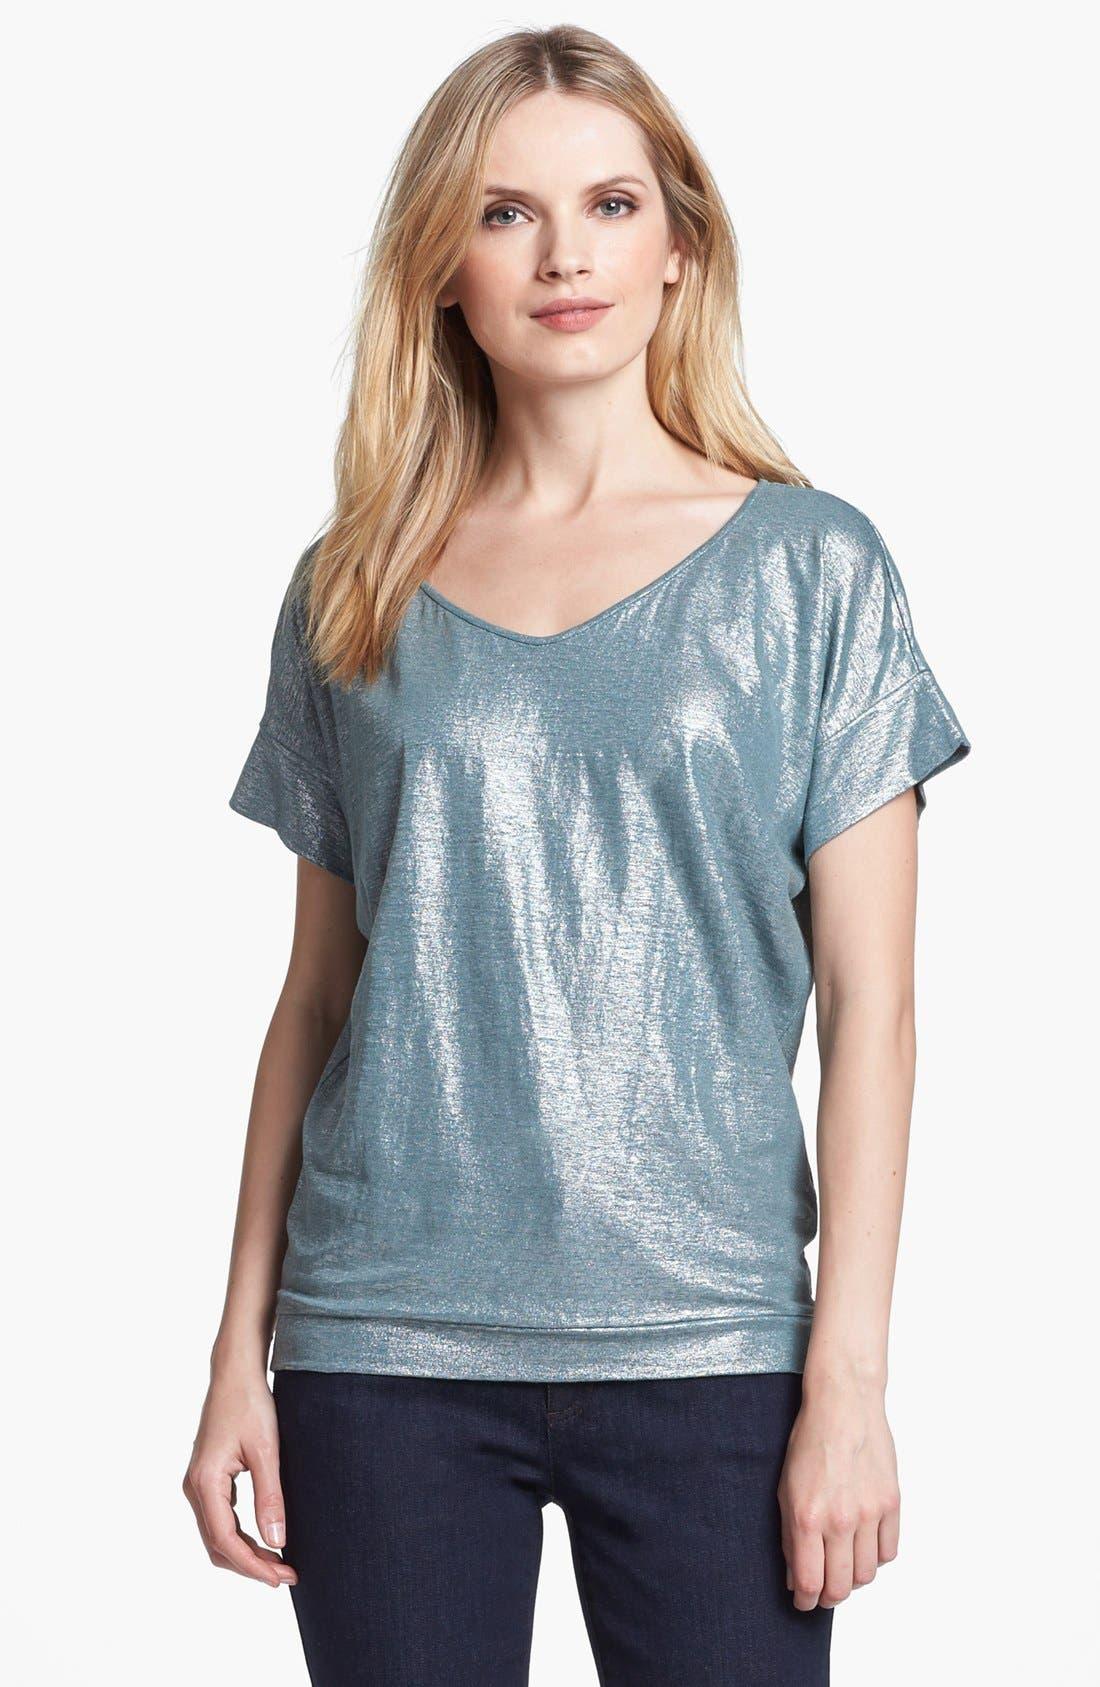 Main Image - Eileen Fisher Metallic Knit Wedge Top